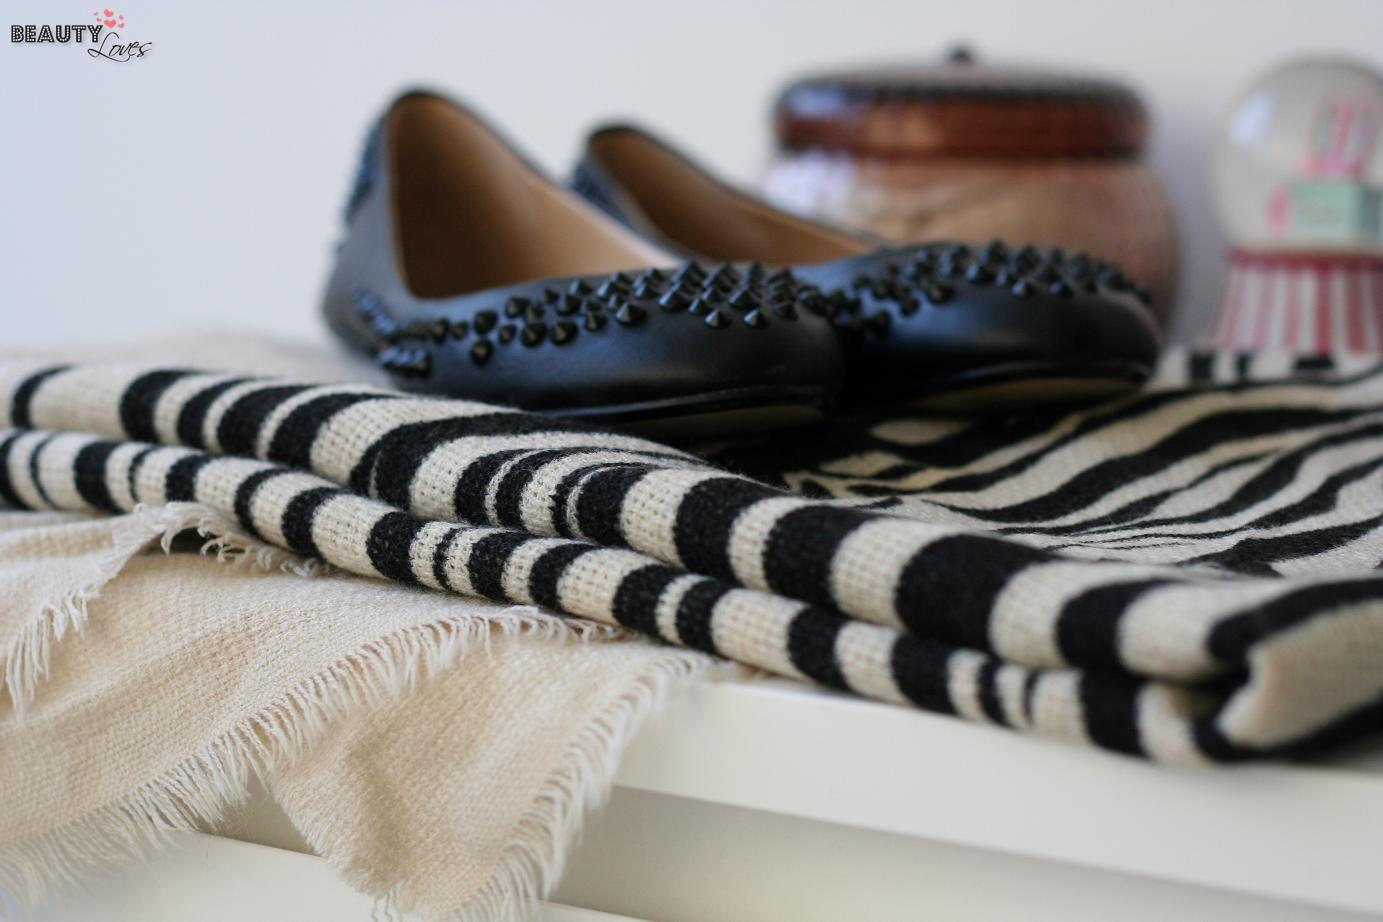 gedetailleerde foto's nieuwe high website voor korting BeautyLoves: FASHION: ZARA SHOPLOG